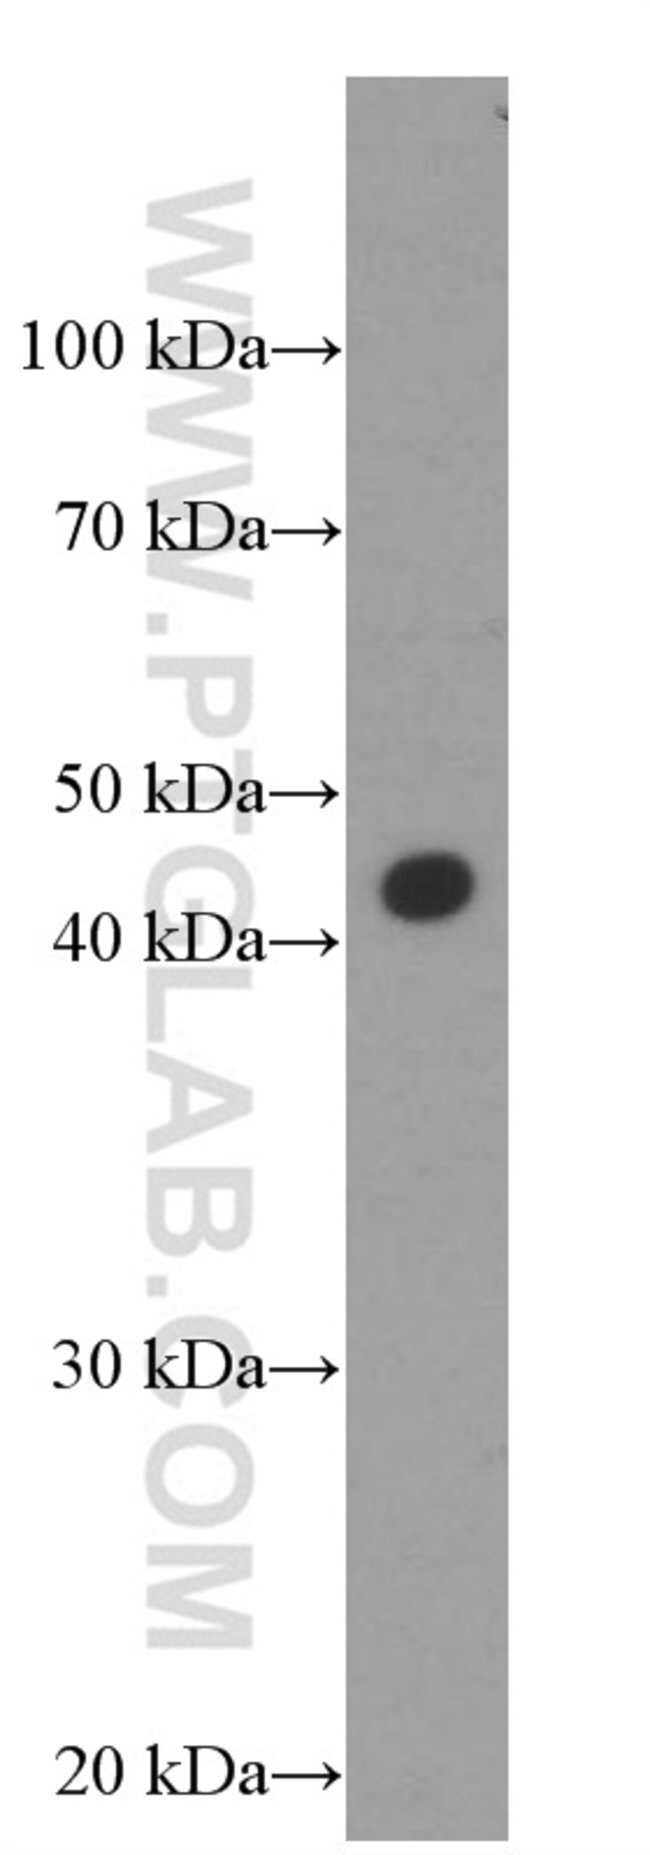 MKP-2 Mouse anti-Human, Mouse, Porcine, Rat, Clone: 1G1C12, Proteintech 150 μL; Unconjugated Ver productos